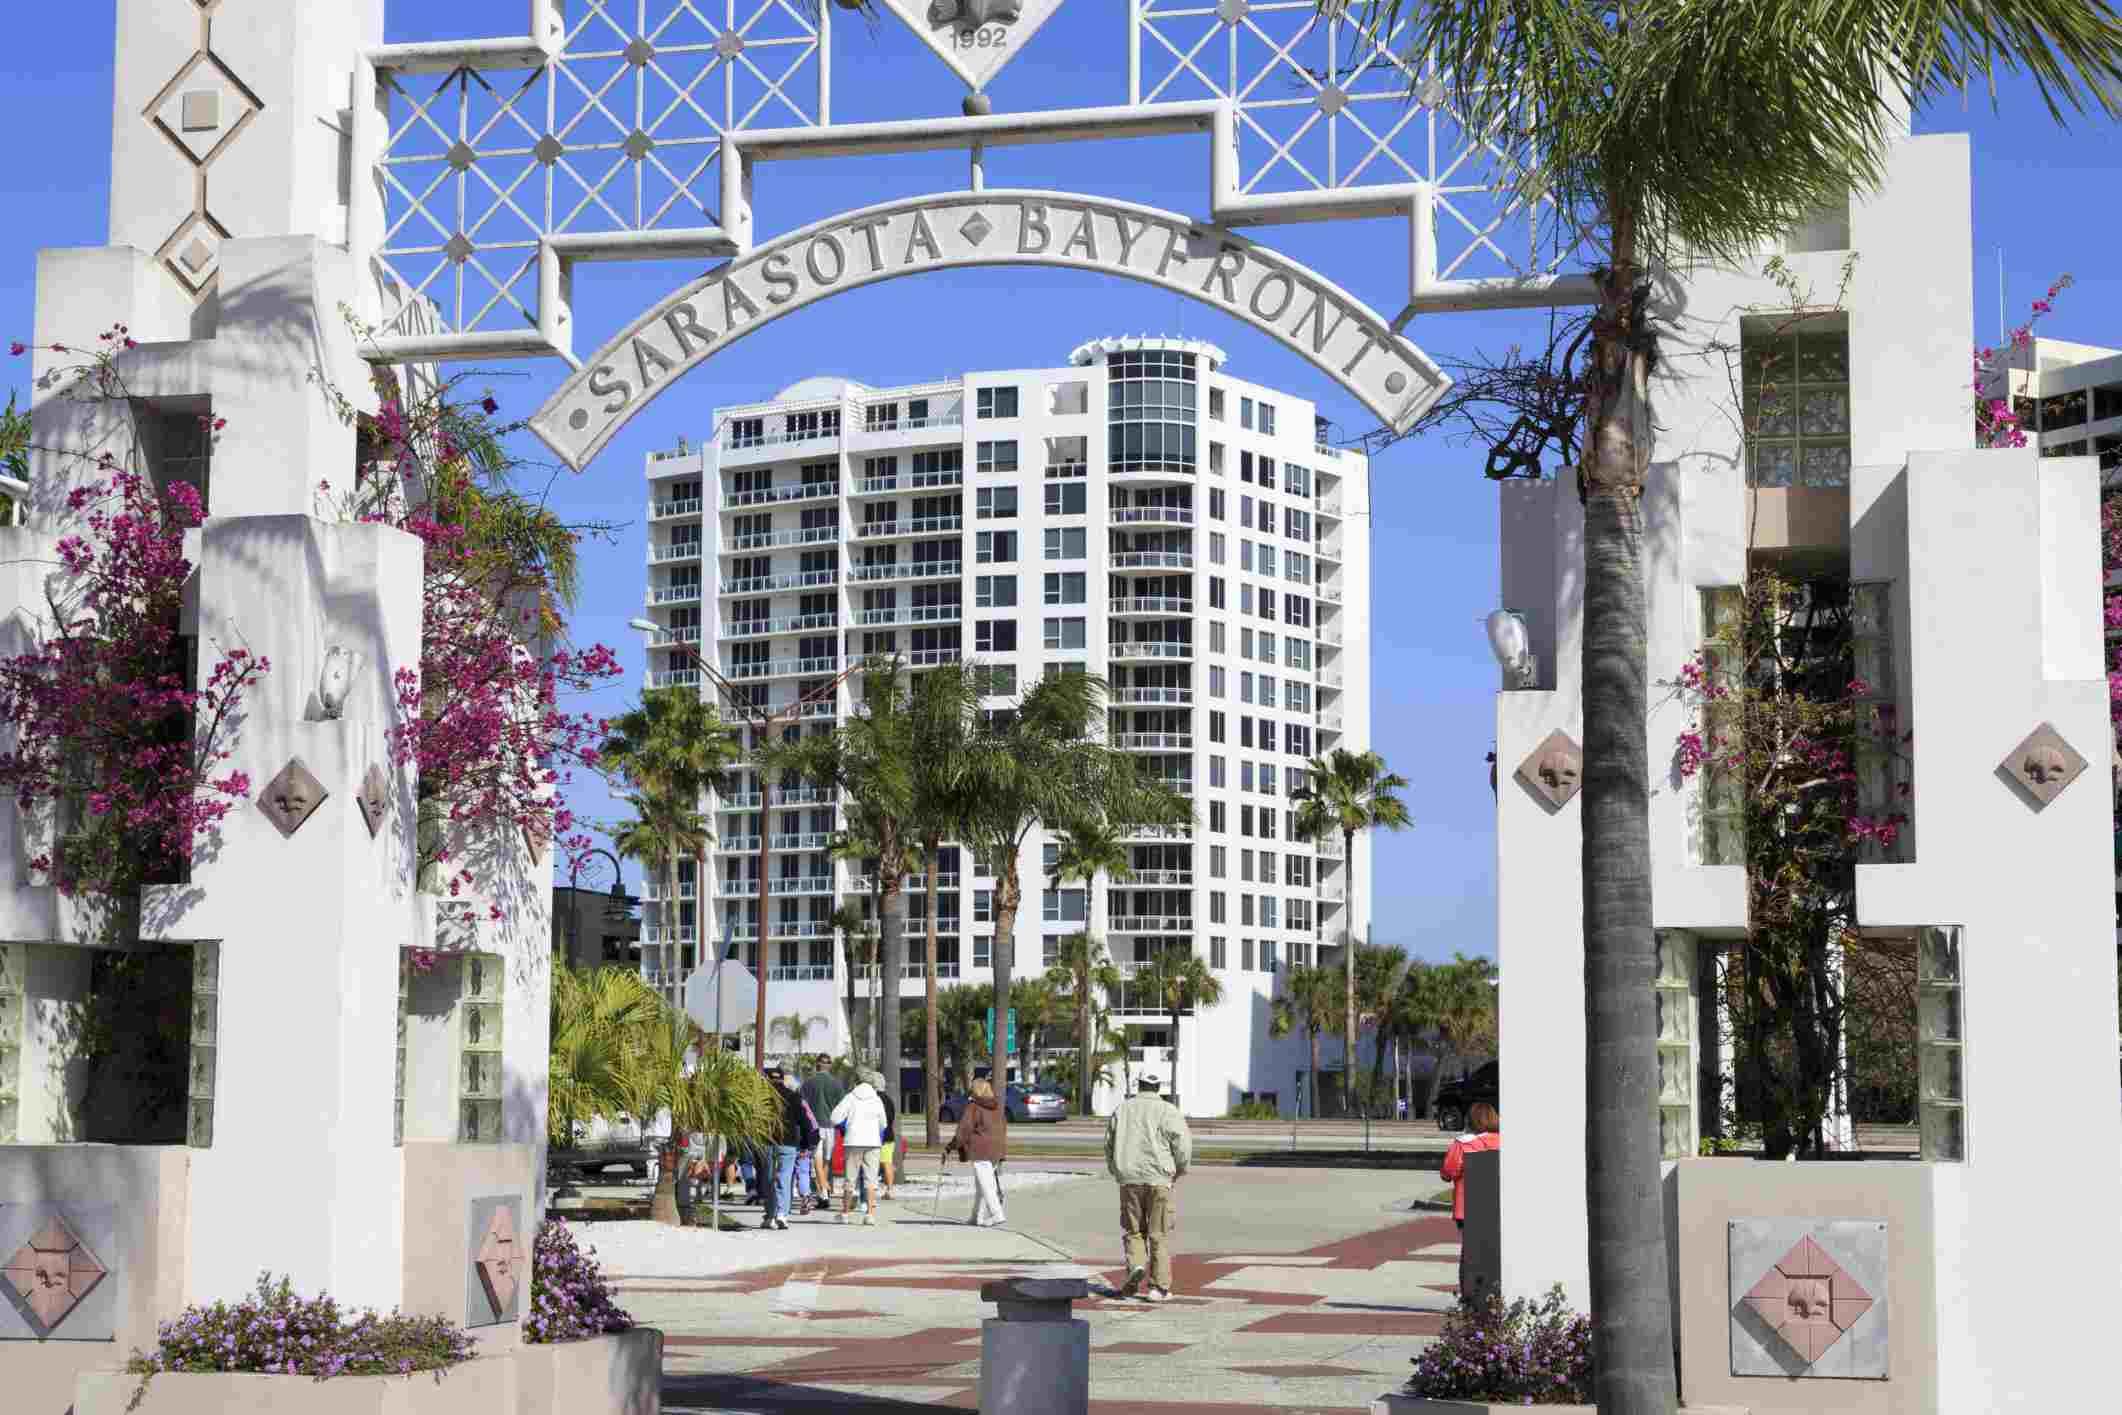 Entrance to Sarasota's Bayfront